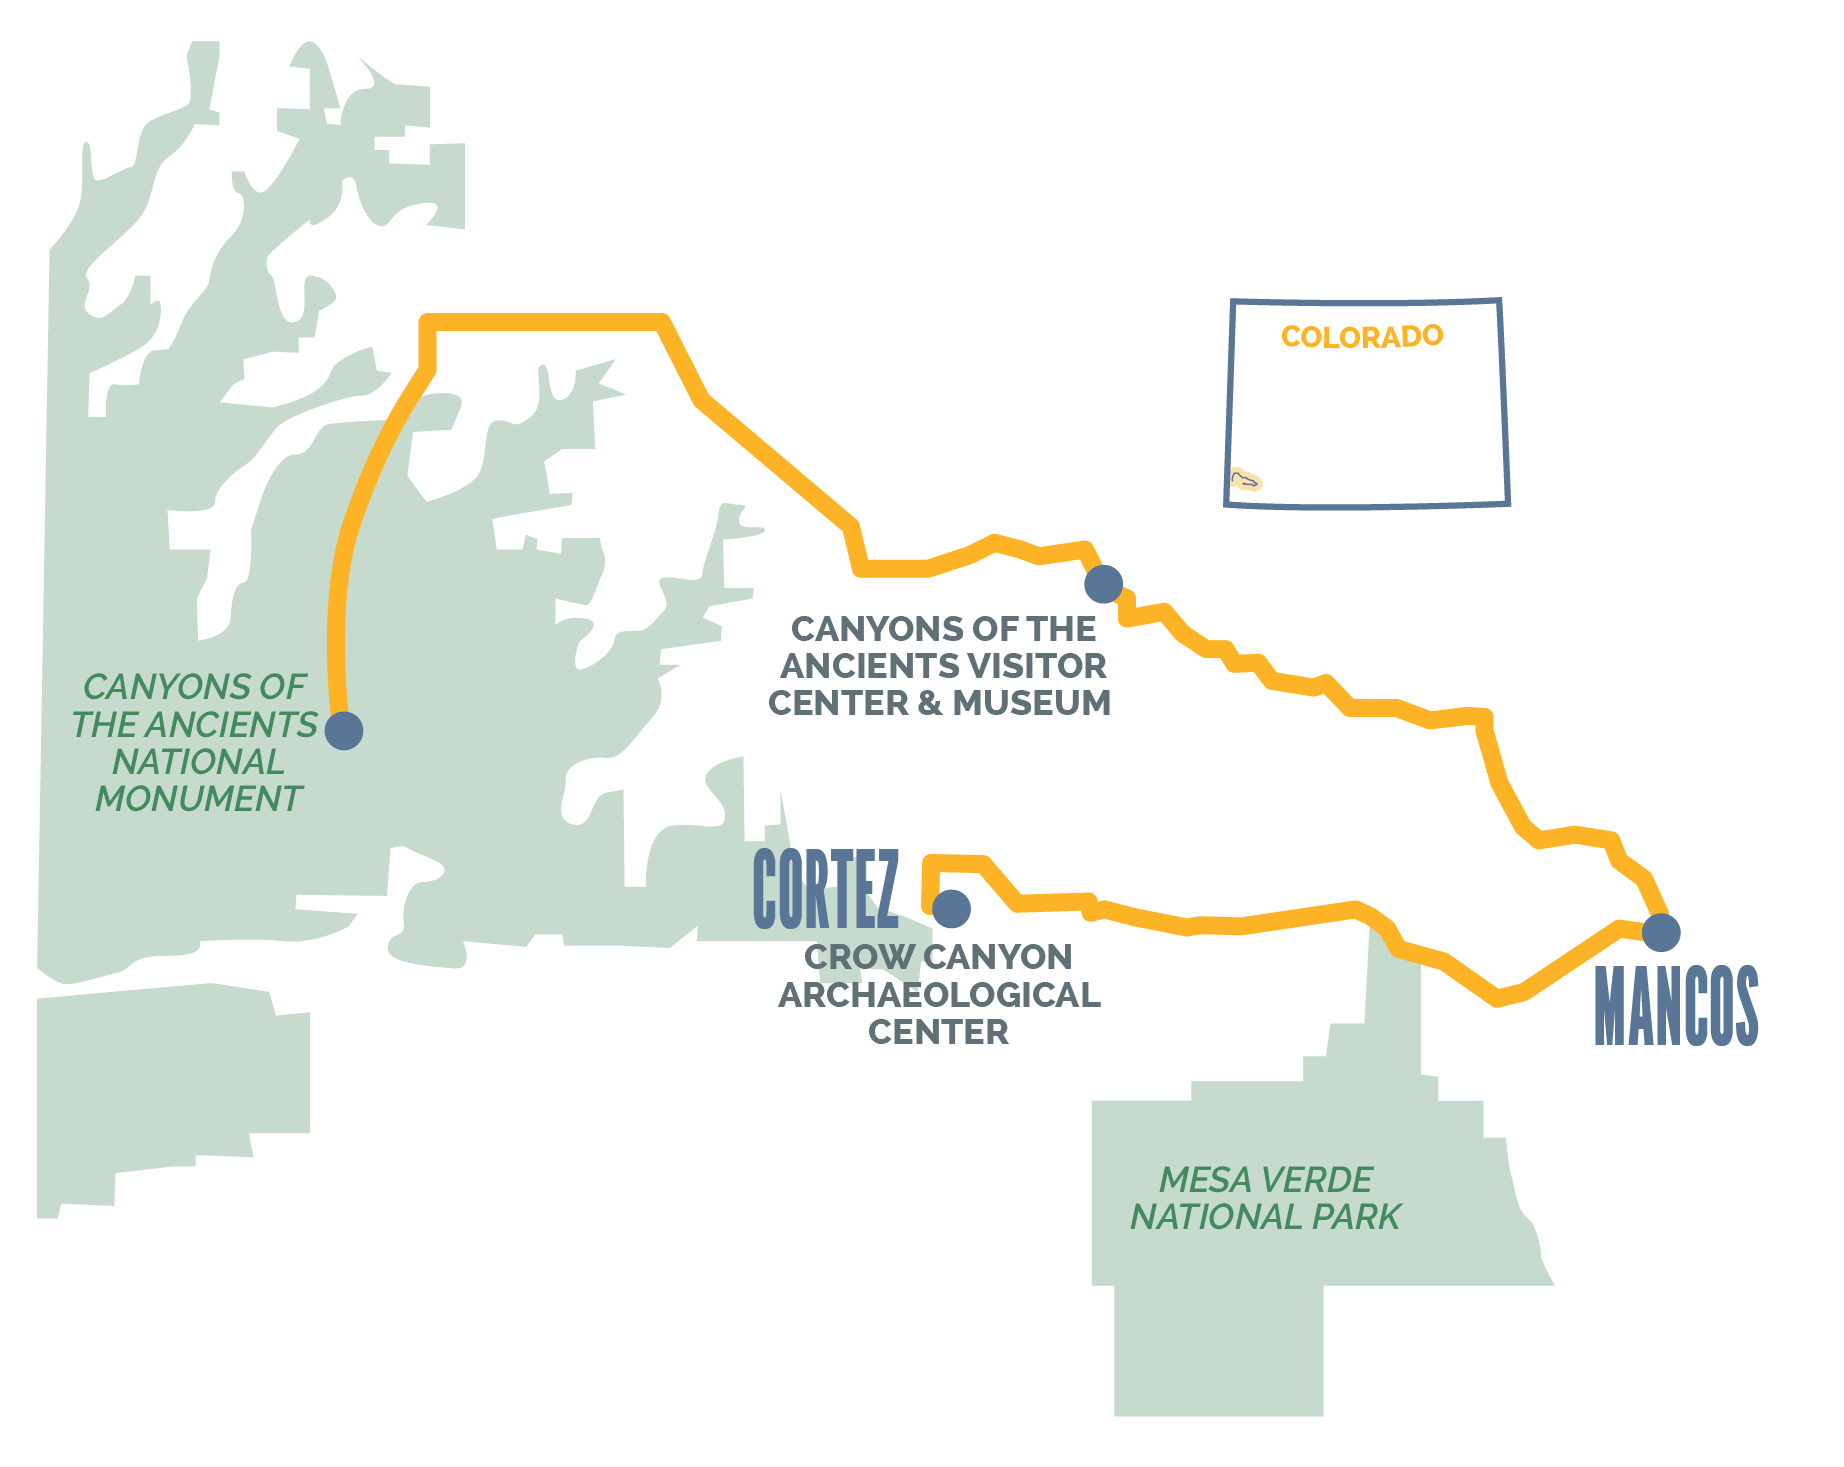 Southwest Colorado Itinerary Map